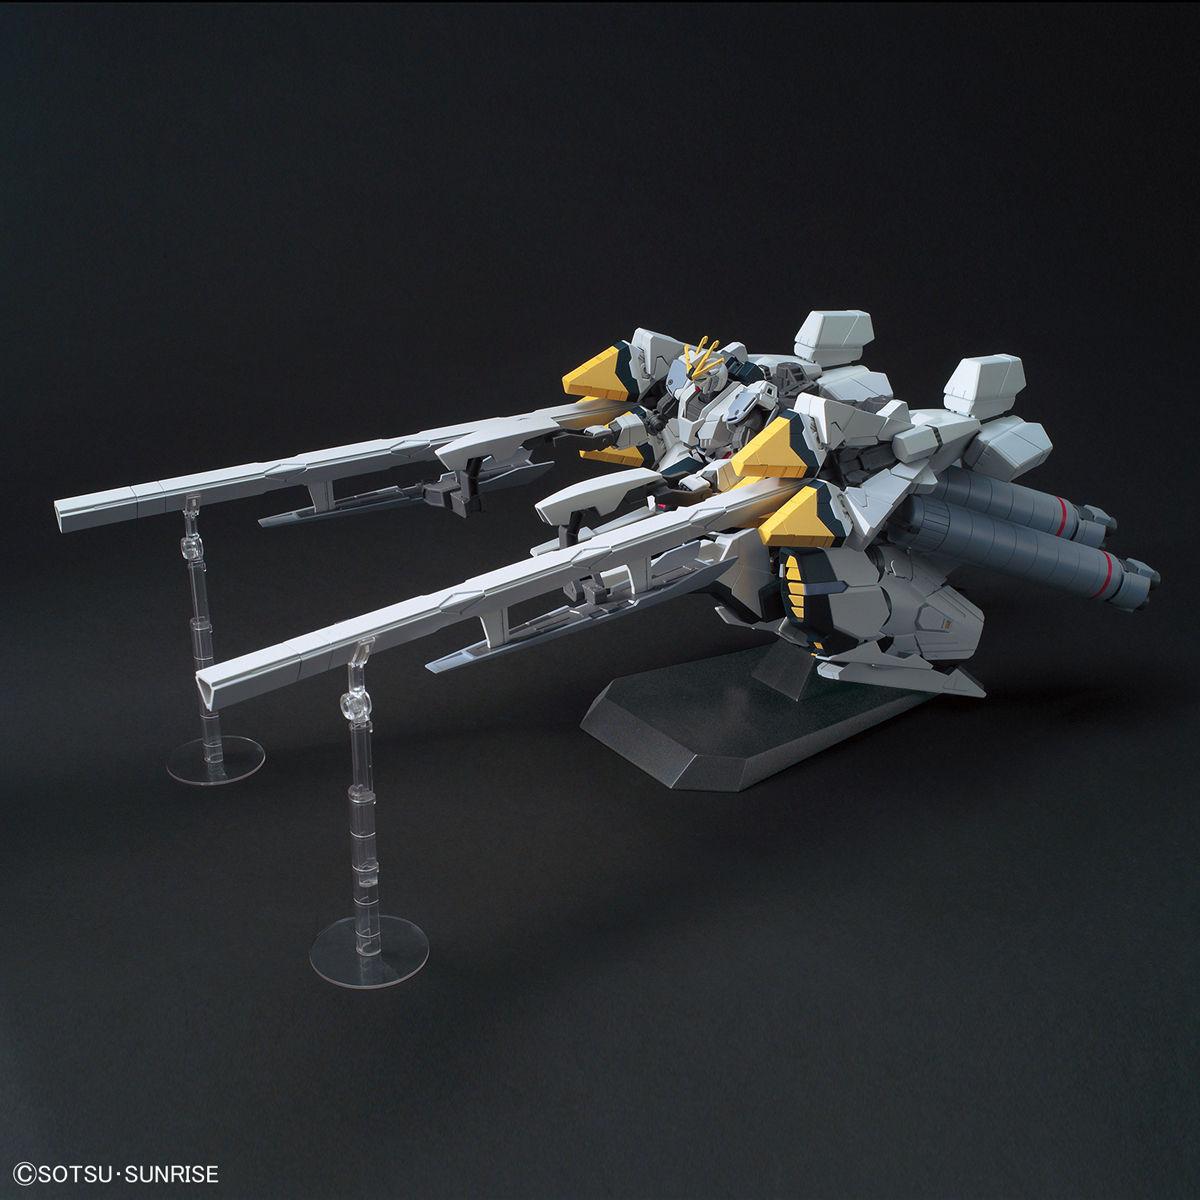 RX-9 ナラティブガンダム [Narrative Gundam]